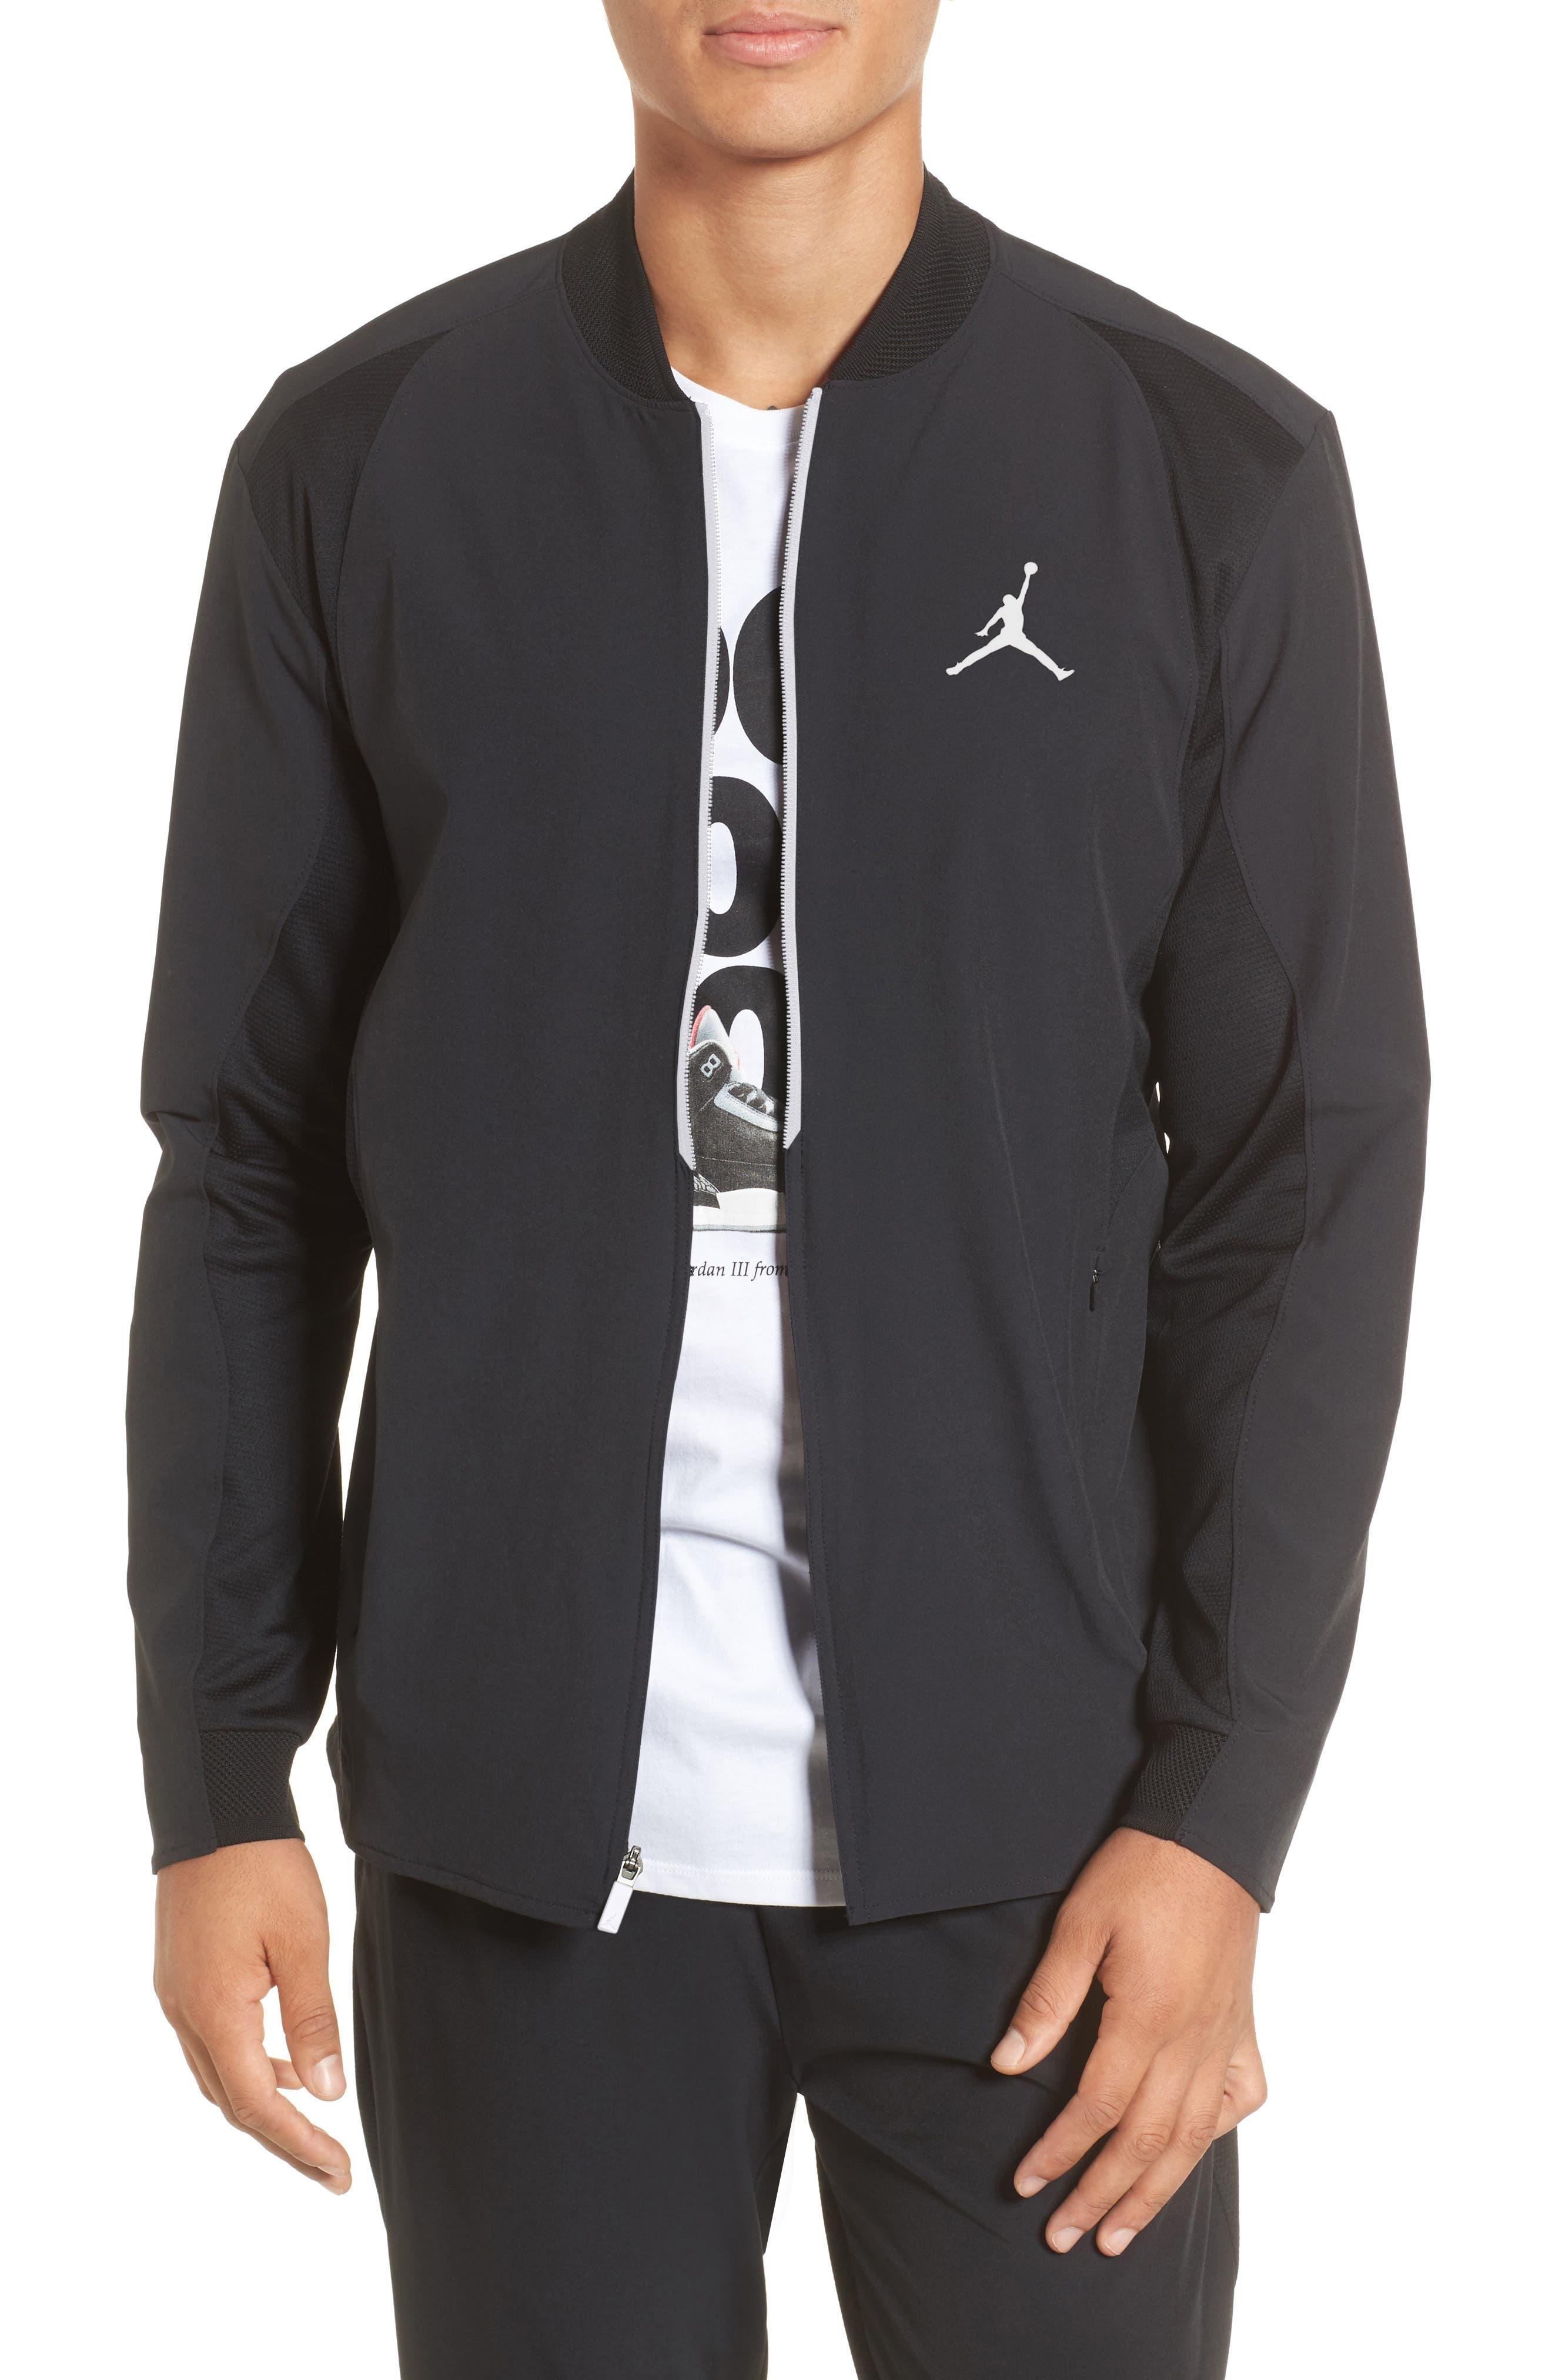 23 Alpha Dry Jacket,                             Main thumbnail 1, color,                             Black/ White